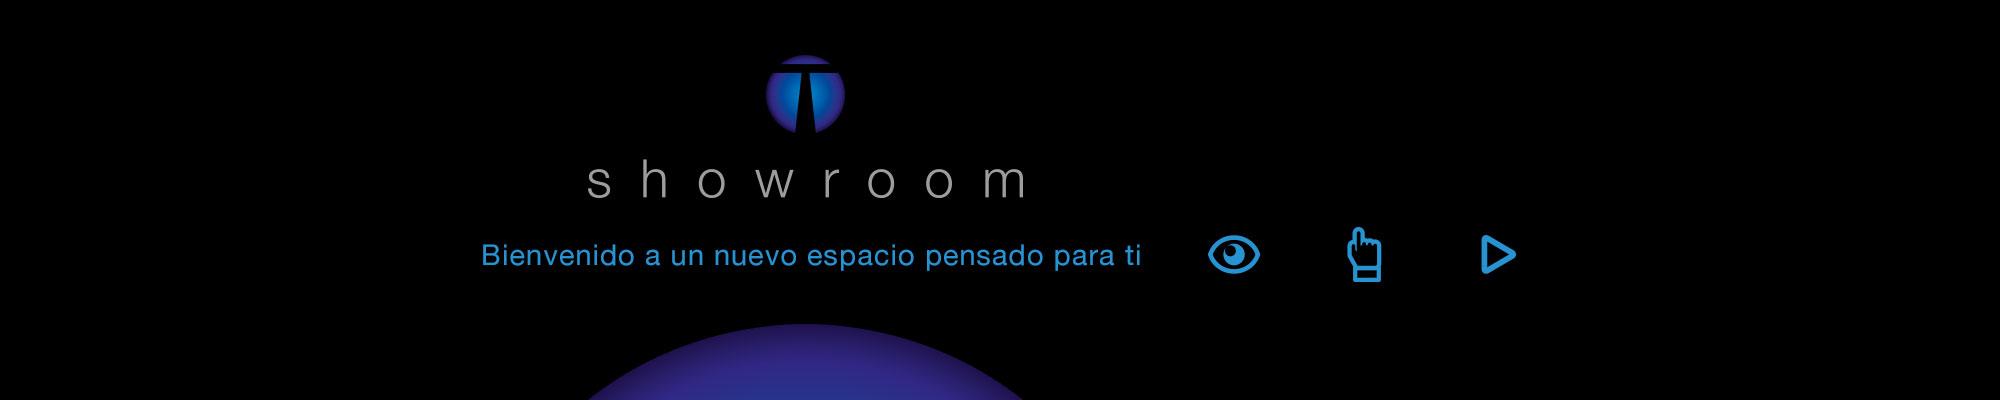 slider-showroom-castellano